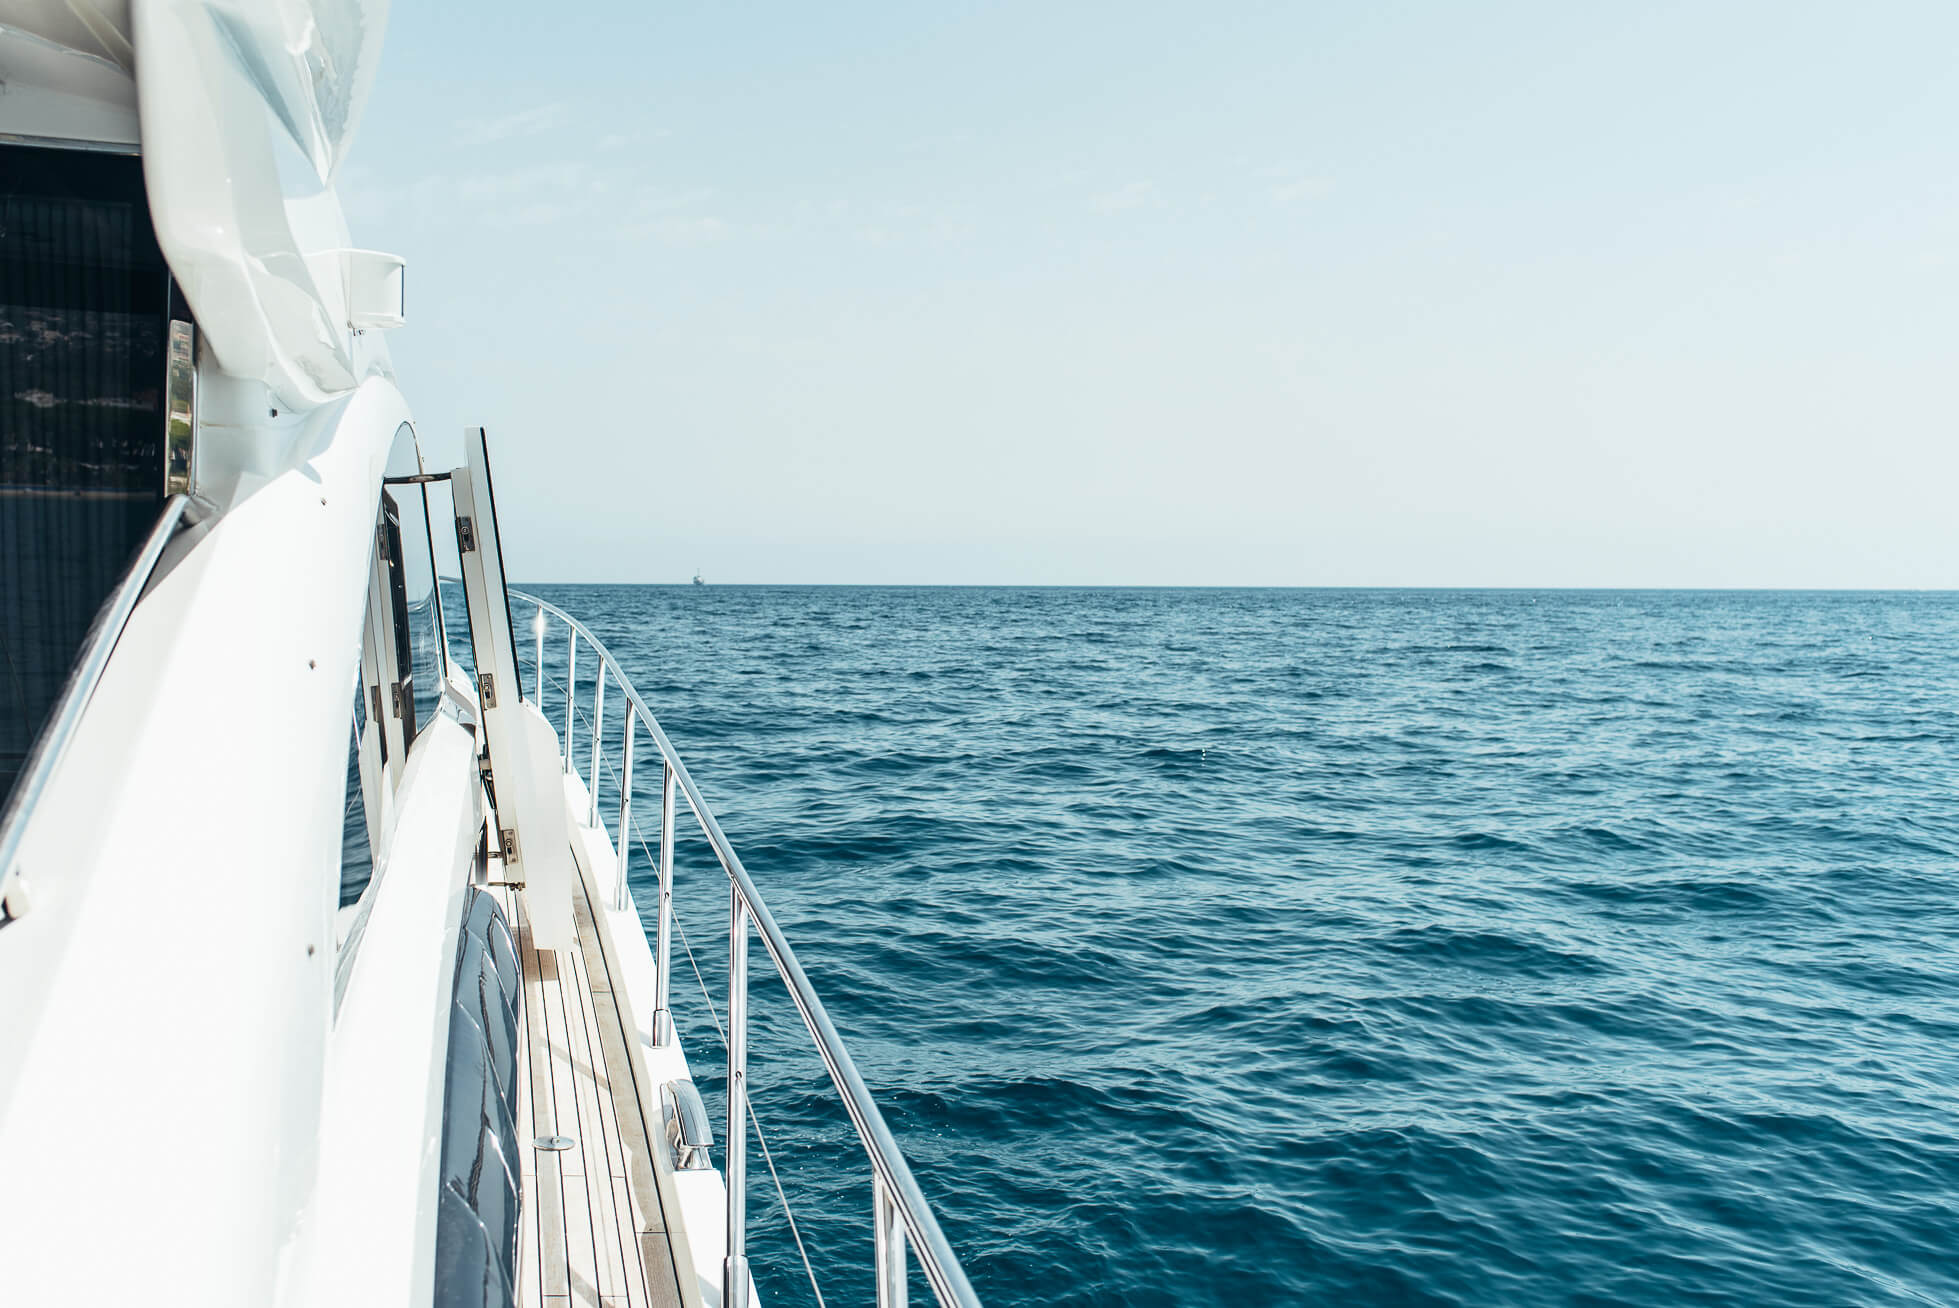 janni-deler-boat-dayDSC_0018